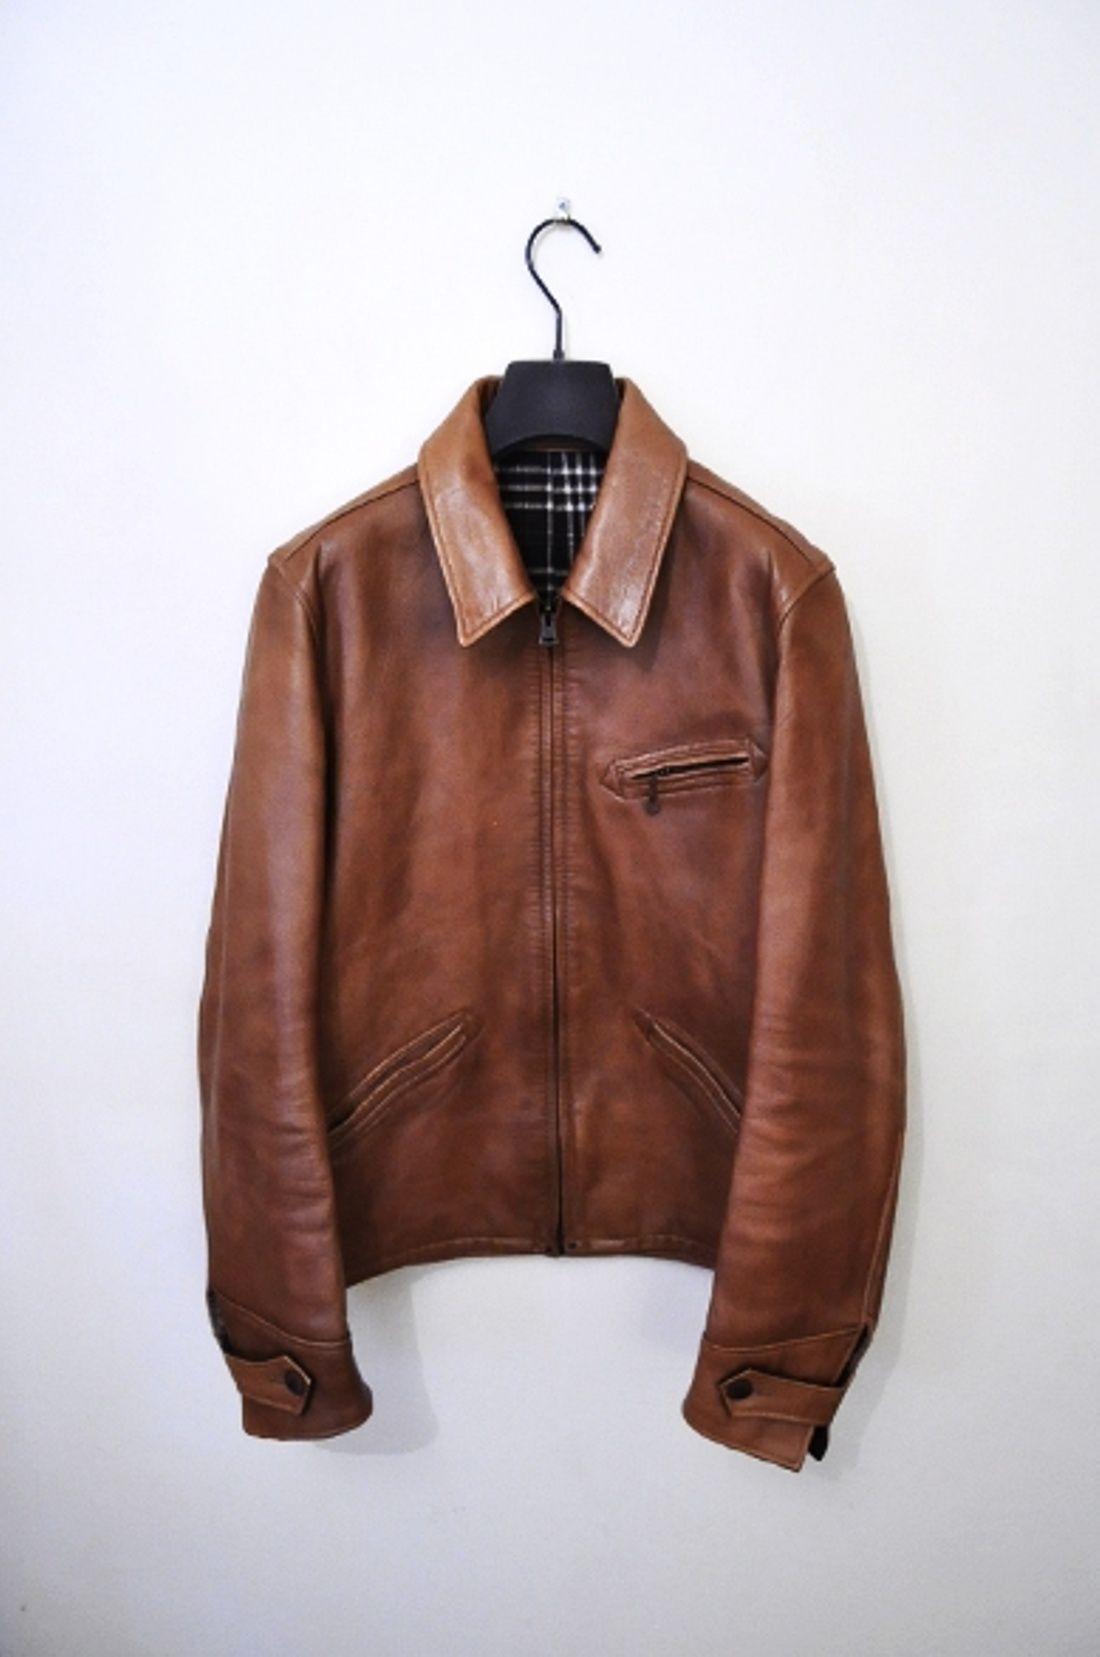 Blackmeans Last Drop Bankrobber X Blackmeans Leather Jacket Made In Japan Size M 400 Jackets Leather Jacket Leather [ 1657 x 1100 Pixel ]